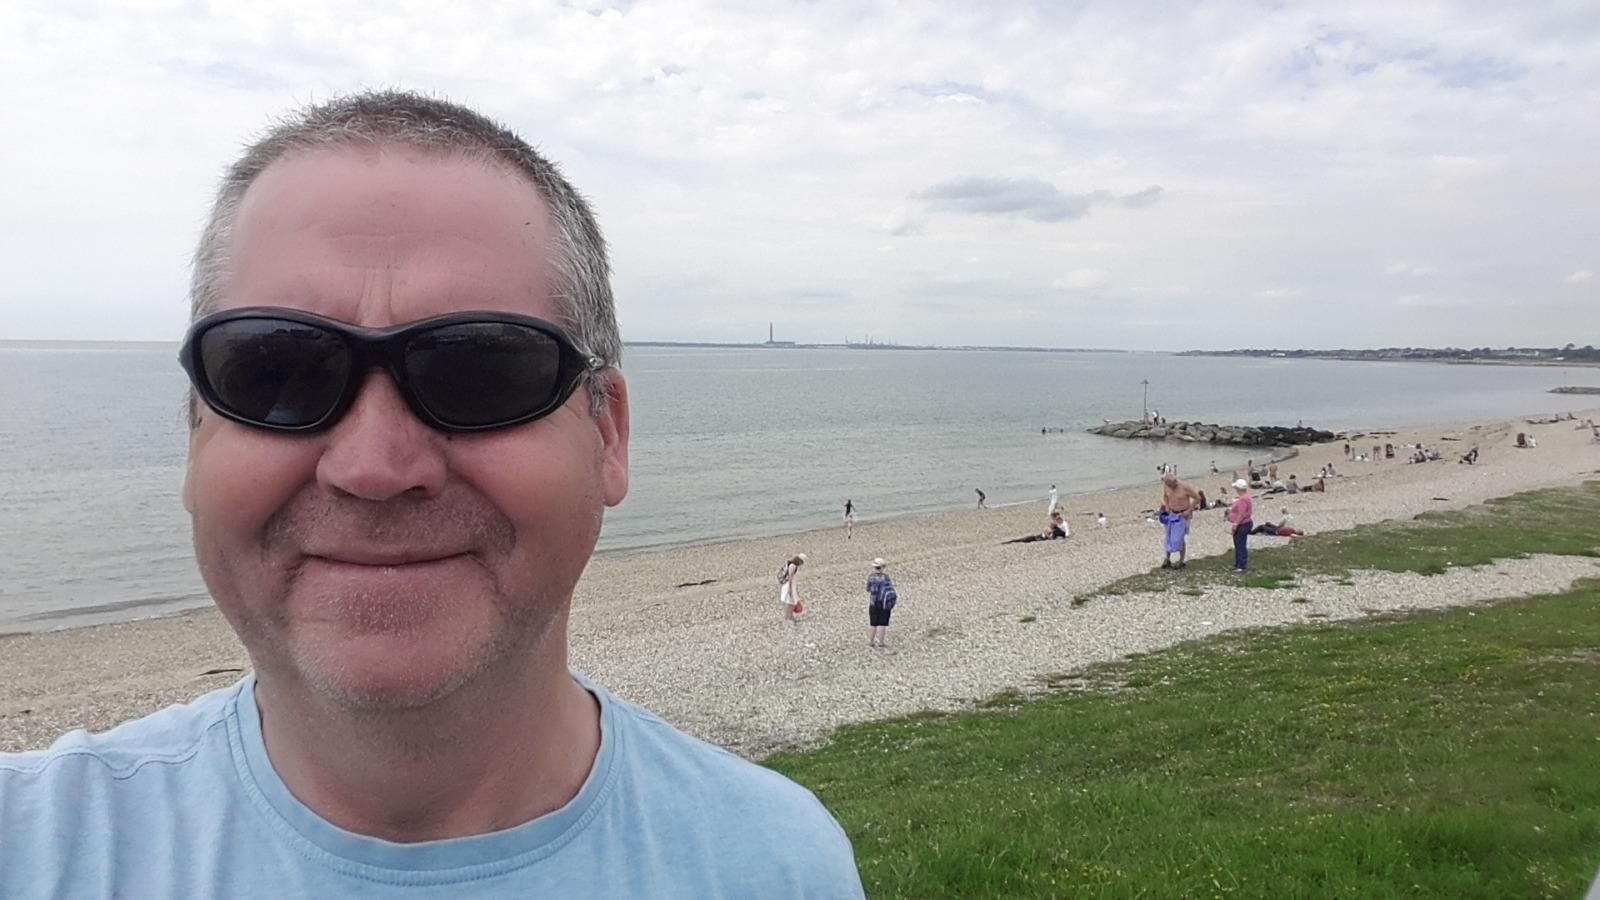 Garry McGivern at Stokes Bay